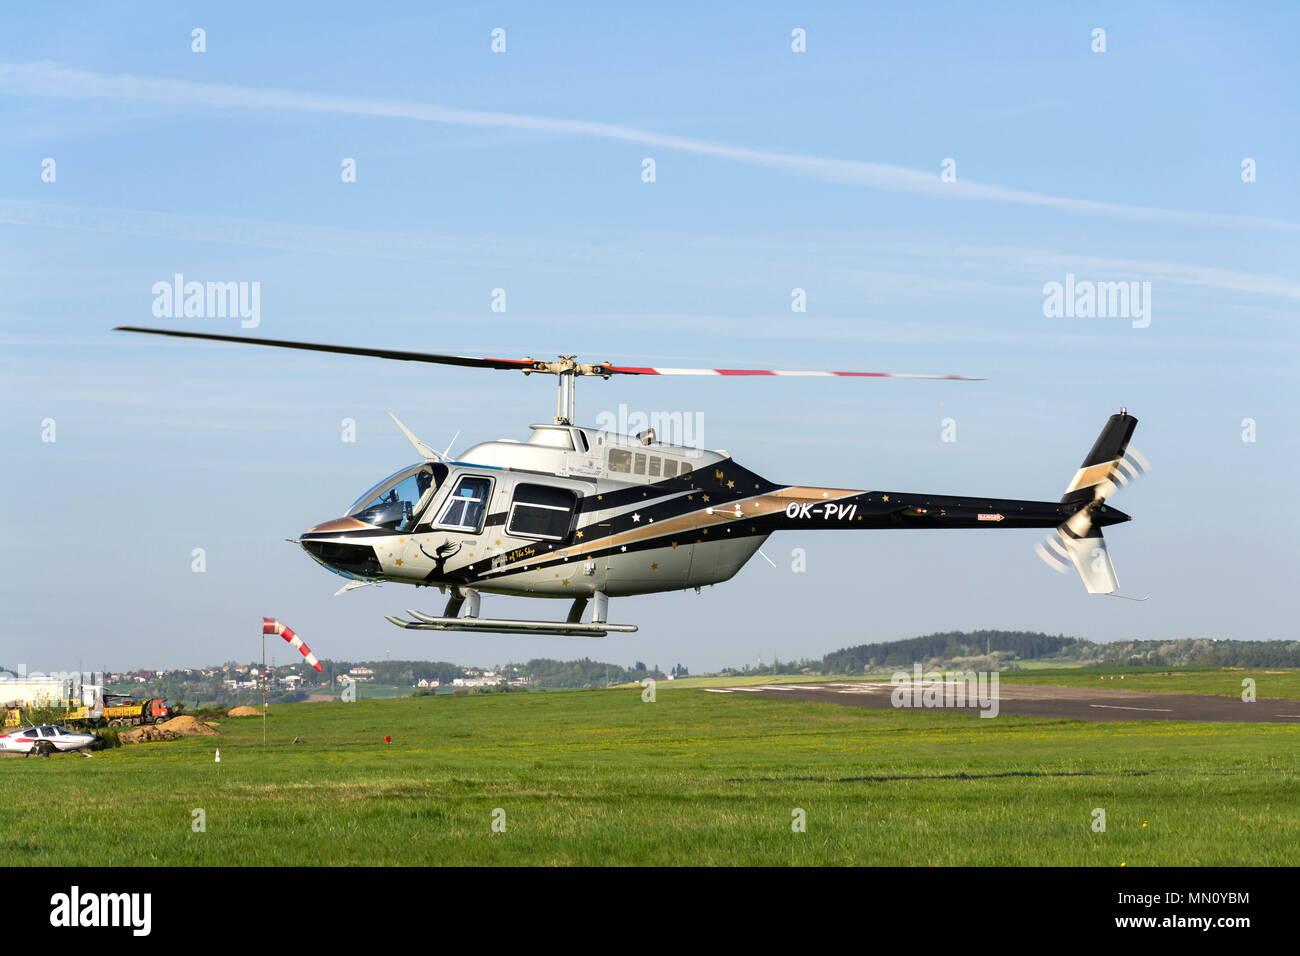 PRIBRAM, CZECH REPUBLIC - APRIL 25 2018: Bell 206 B JetRanger III two-bladed helicopter landing on April 25 2018 in Pribram, Czech Republic. - Stock Image